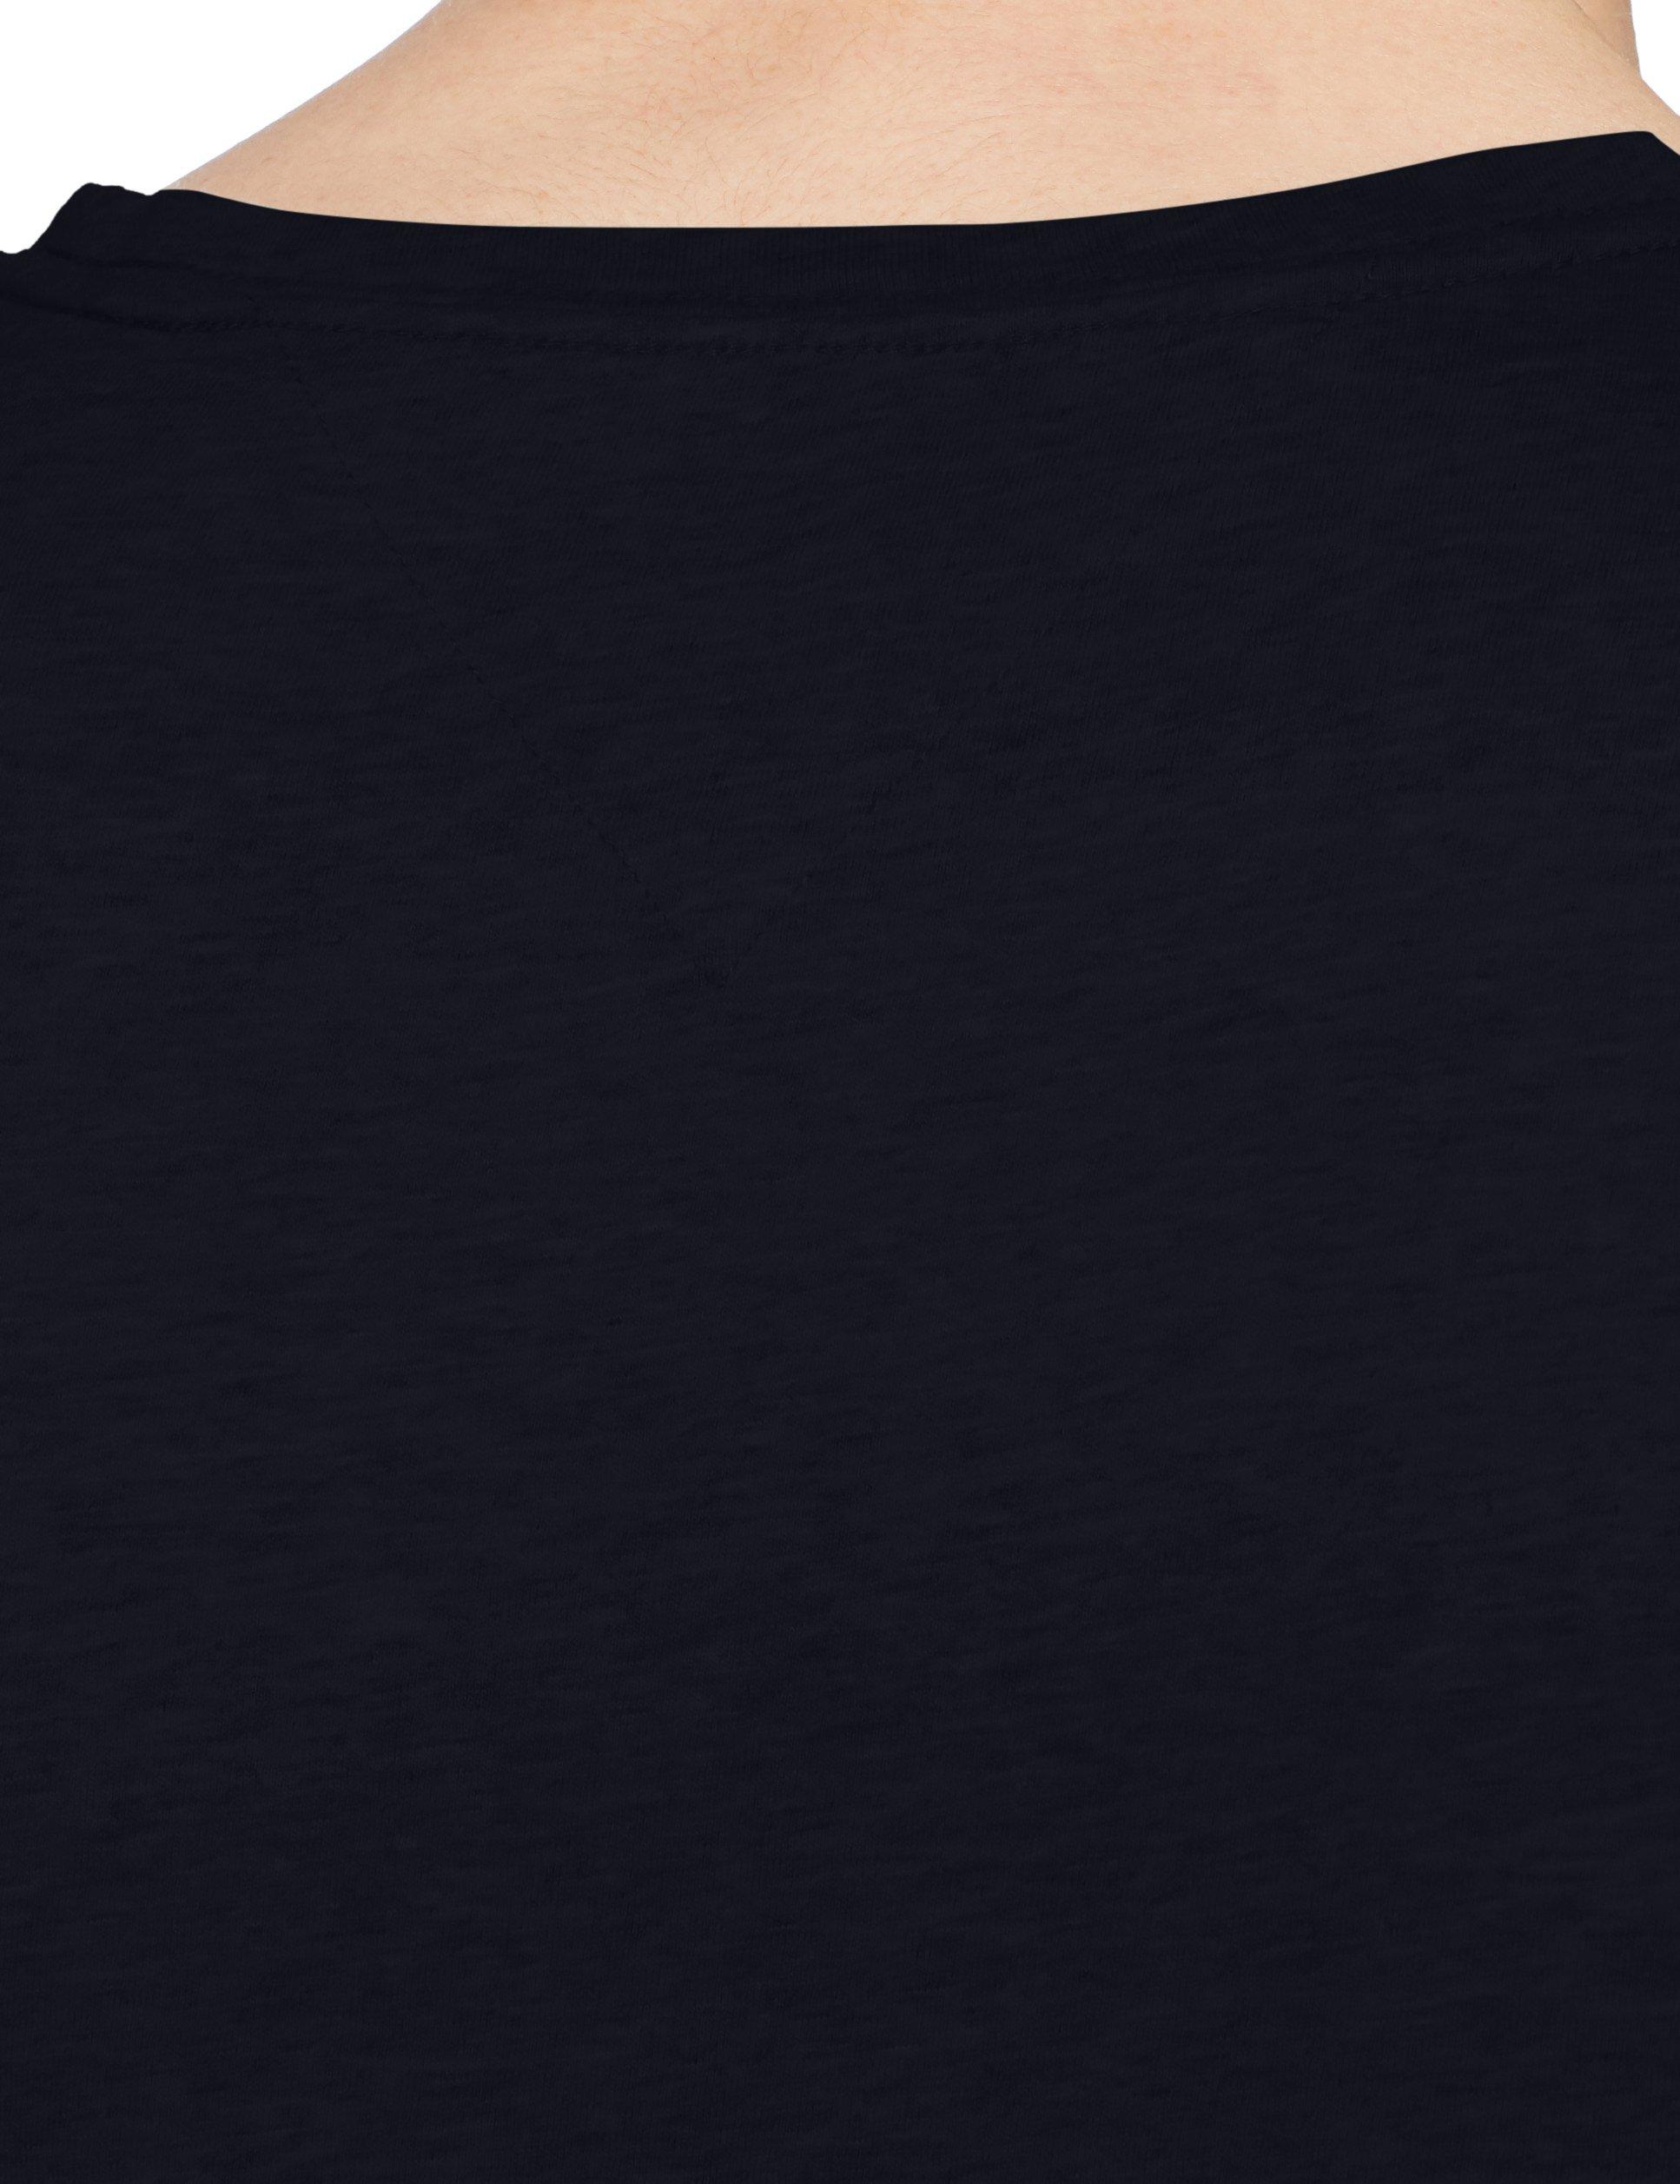 Tommy Hilfiger Hilfiger Graphic tee Camiseta para Hombre